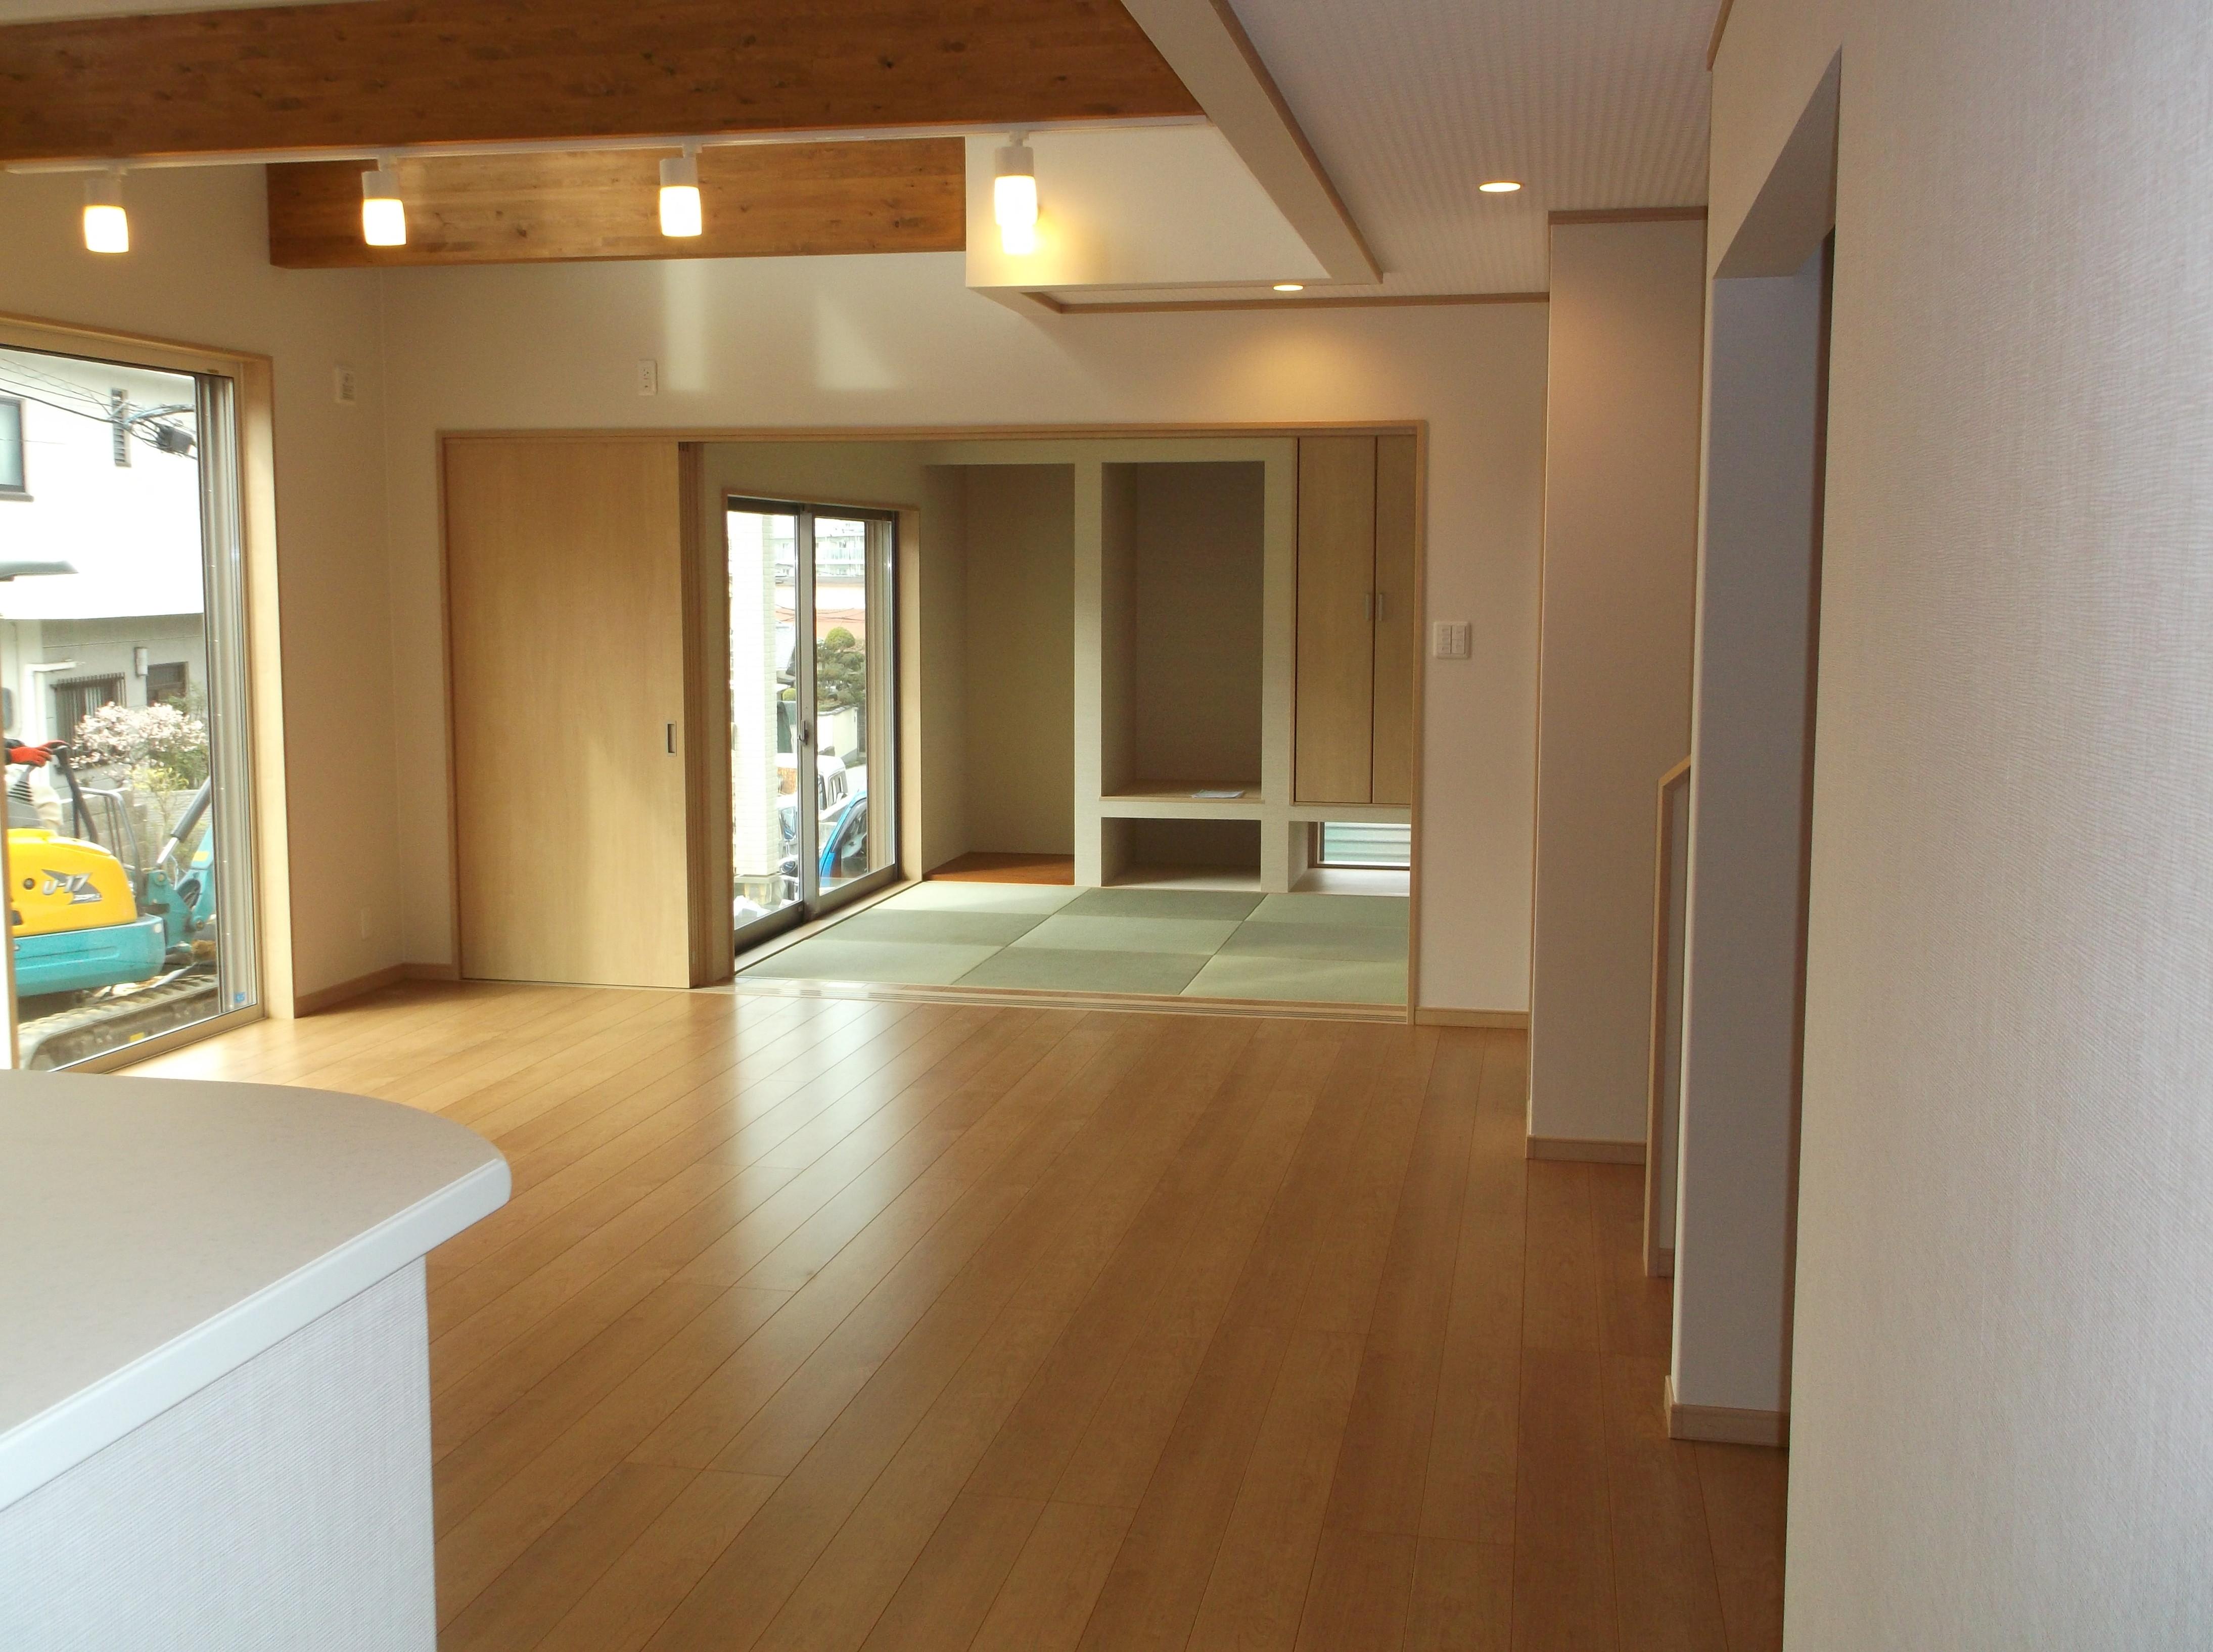 神戸市 個人住宅新築工事イメージ03